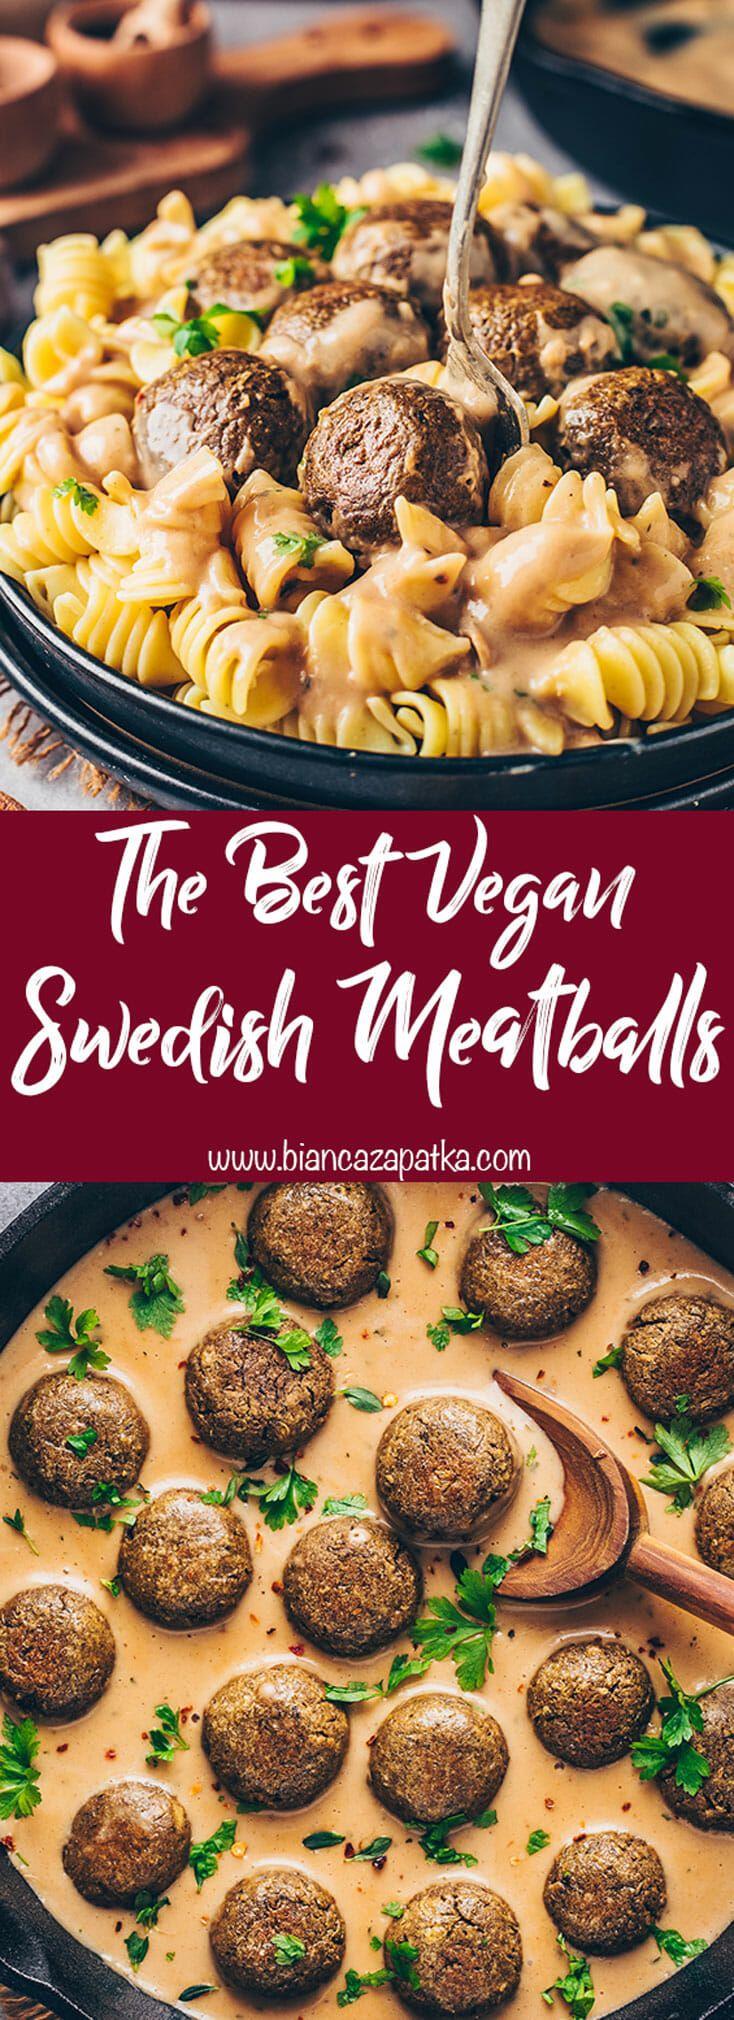 Vegan Swedish Meatballs Recipe - Bianca Zapatka | Recipes